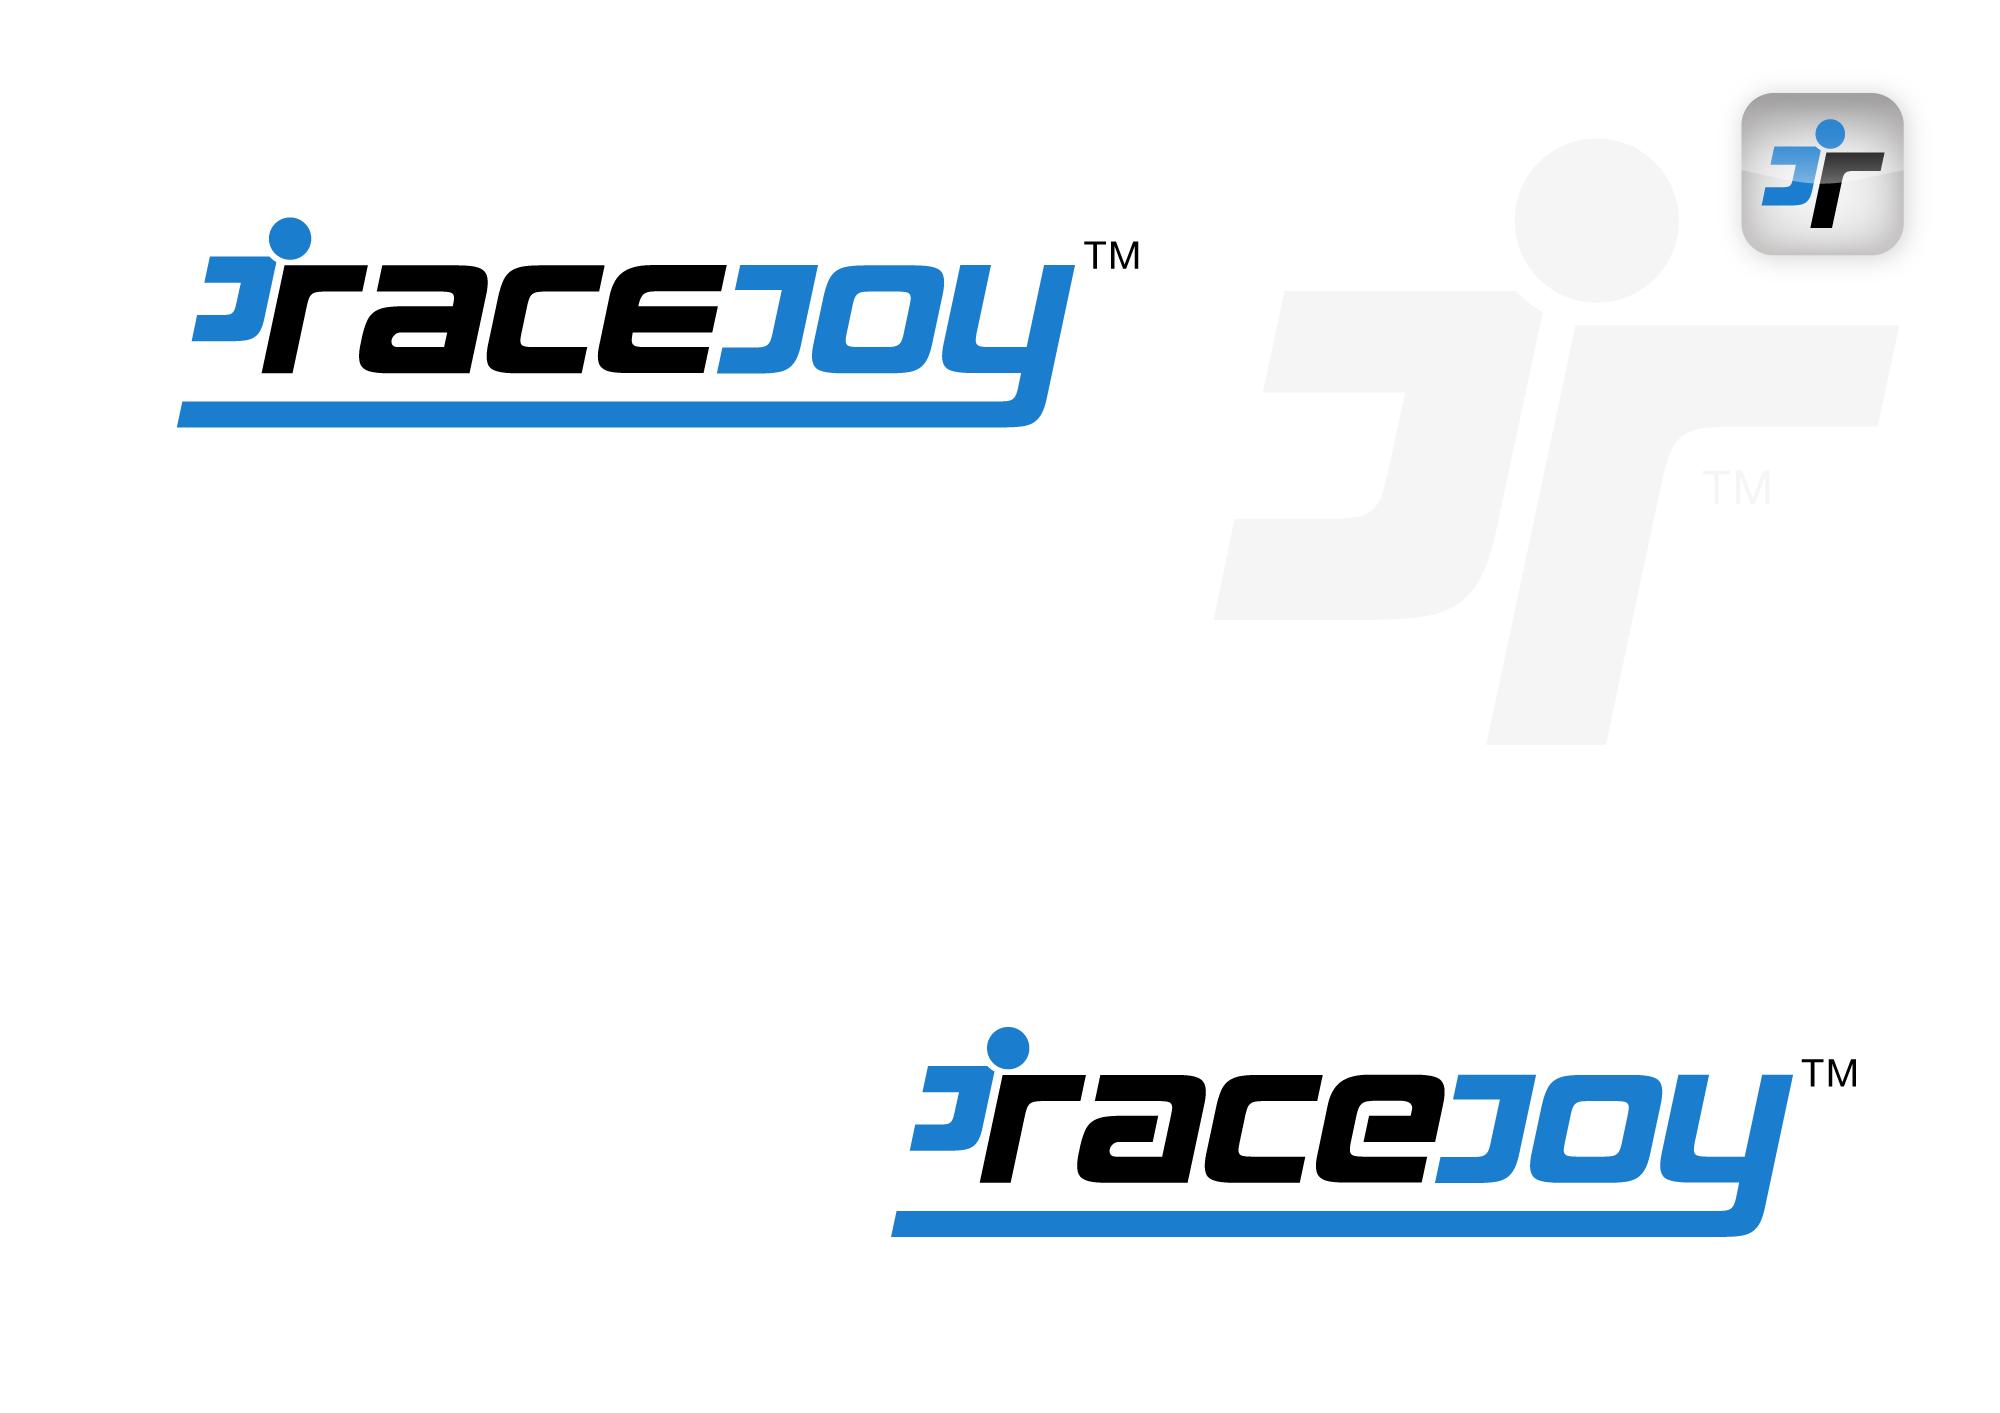 *Prize Guaranteed* RaceJoy tm needs a new logo